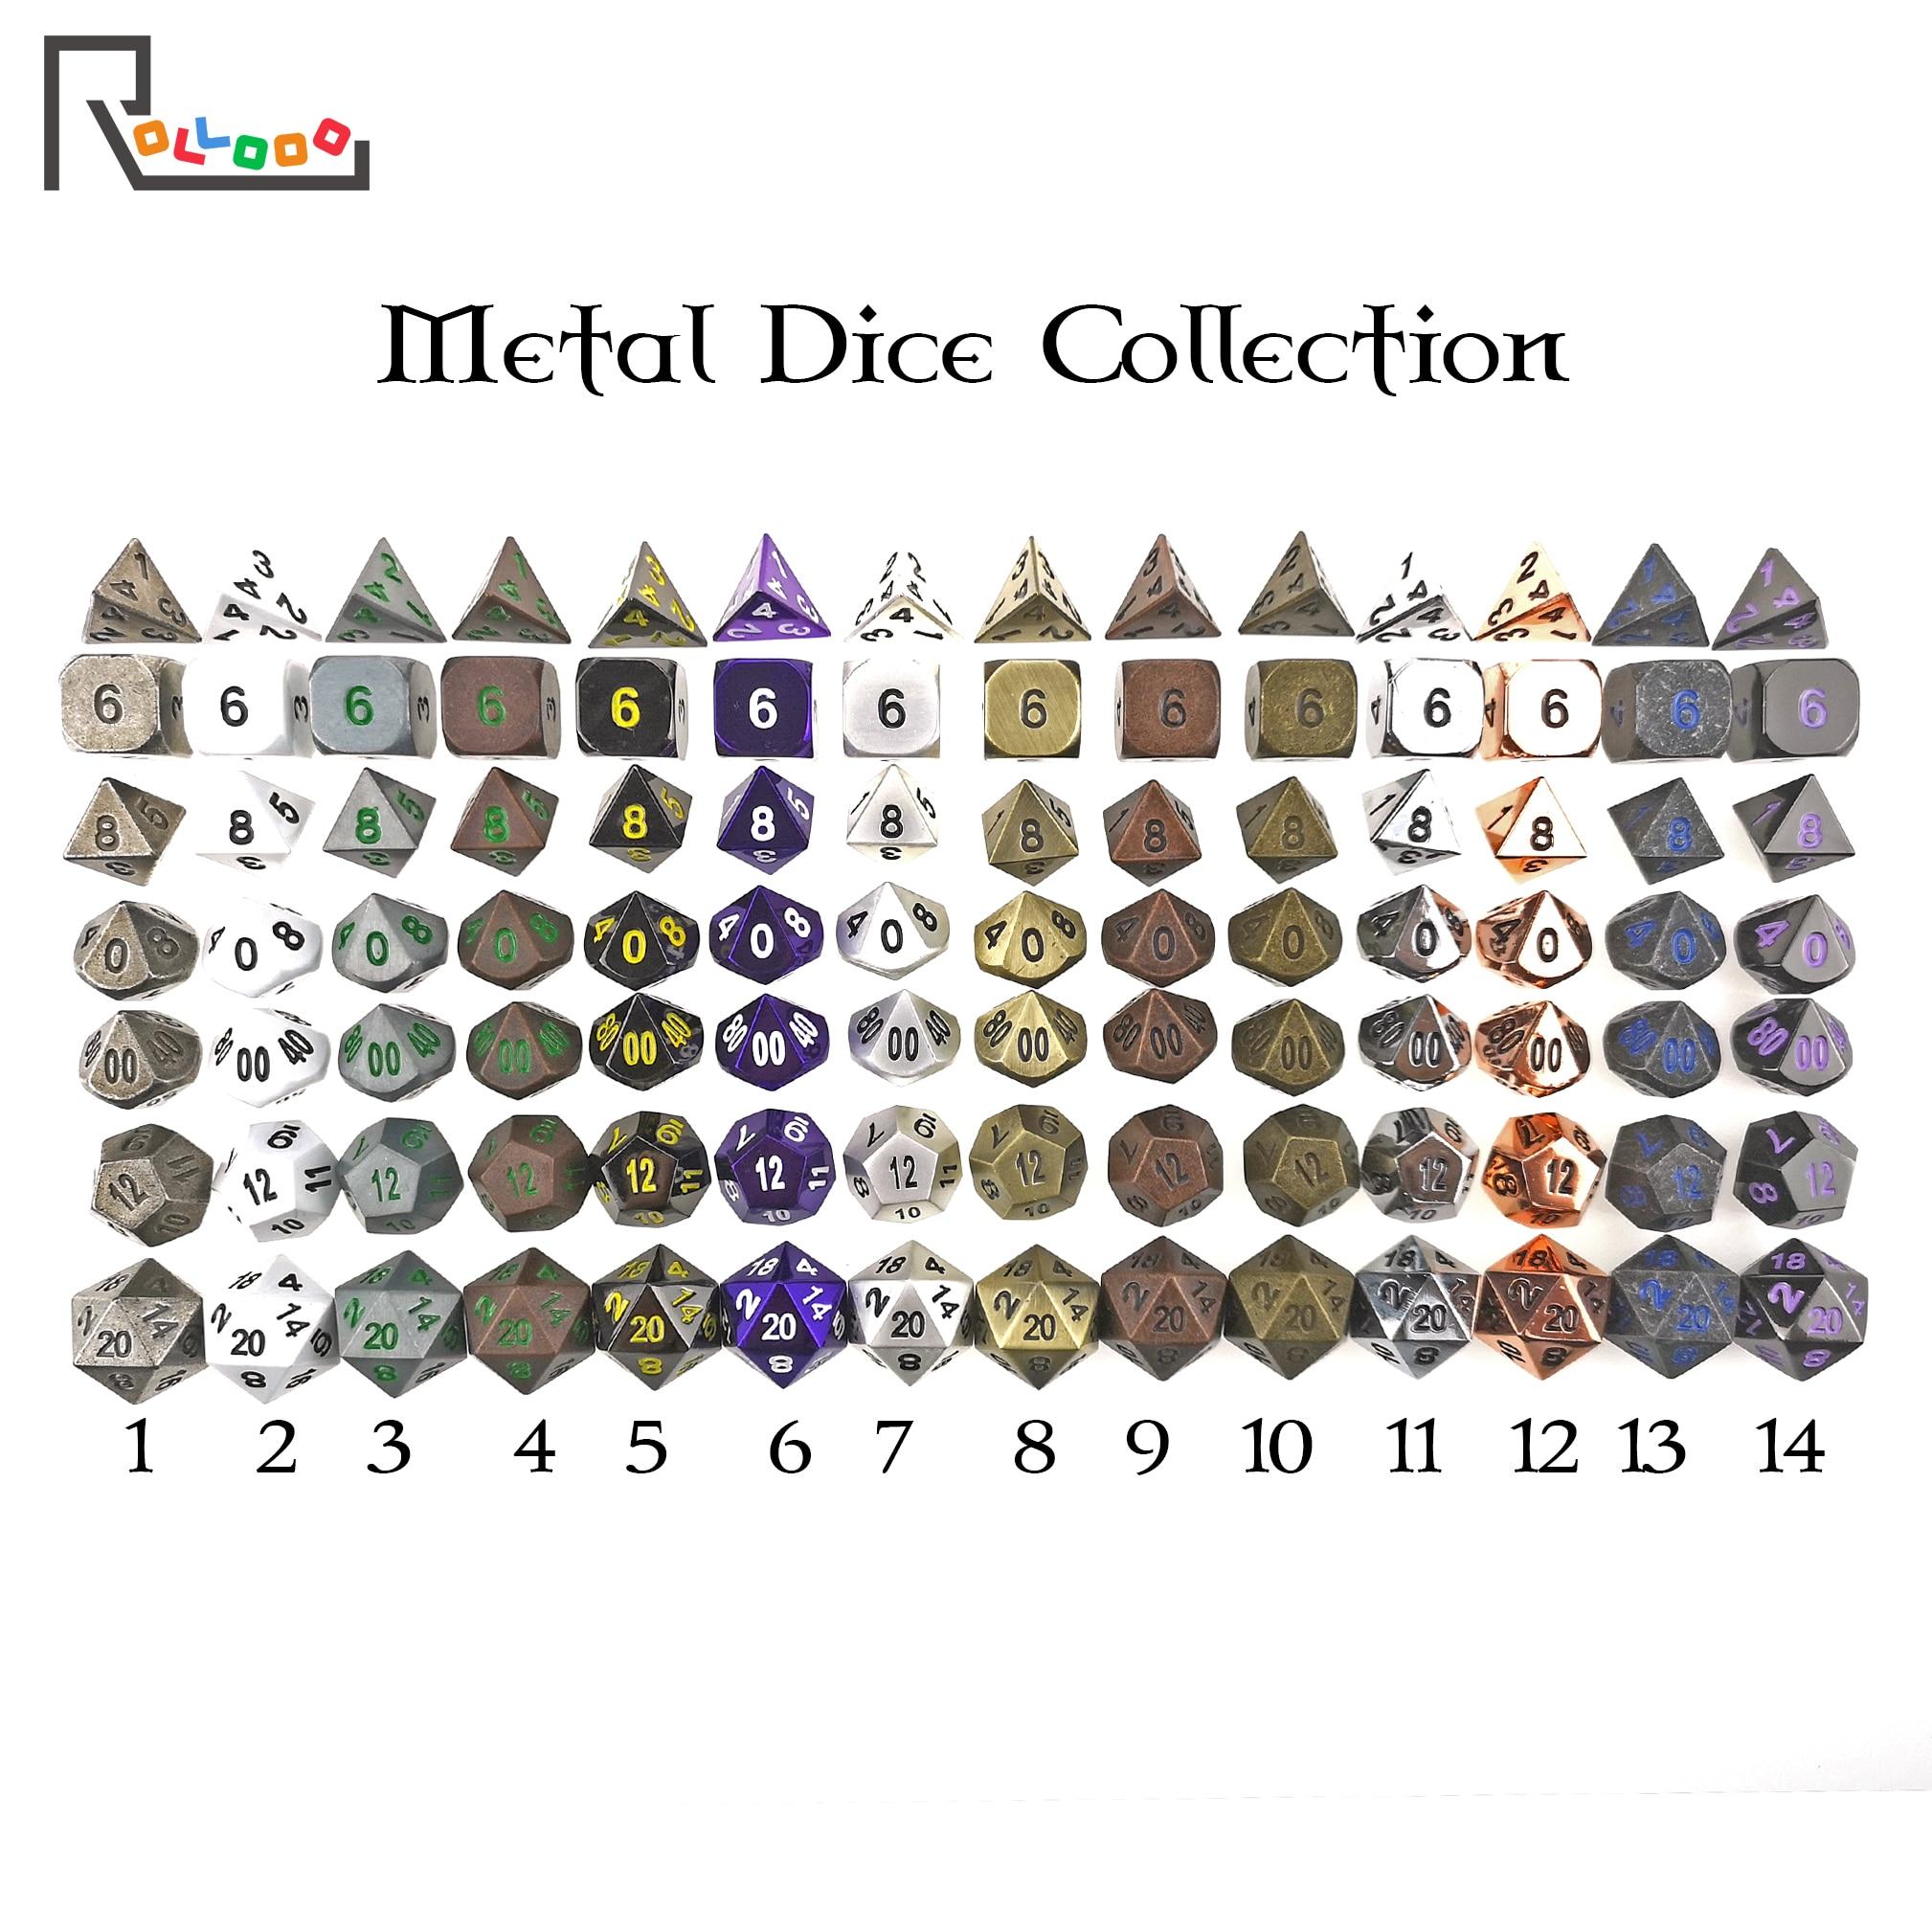 Rollooo 23 Colors DND Metal Dice Collection D&D Sets For RPG Roleplaying Games D4 D6 D8 D10 D% D12 D20